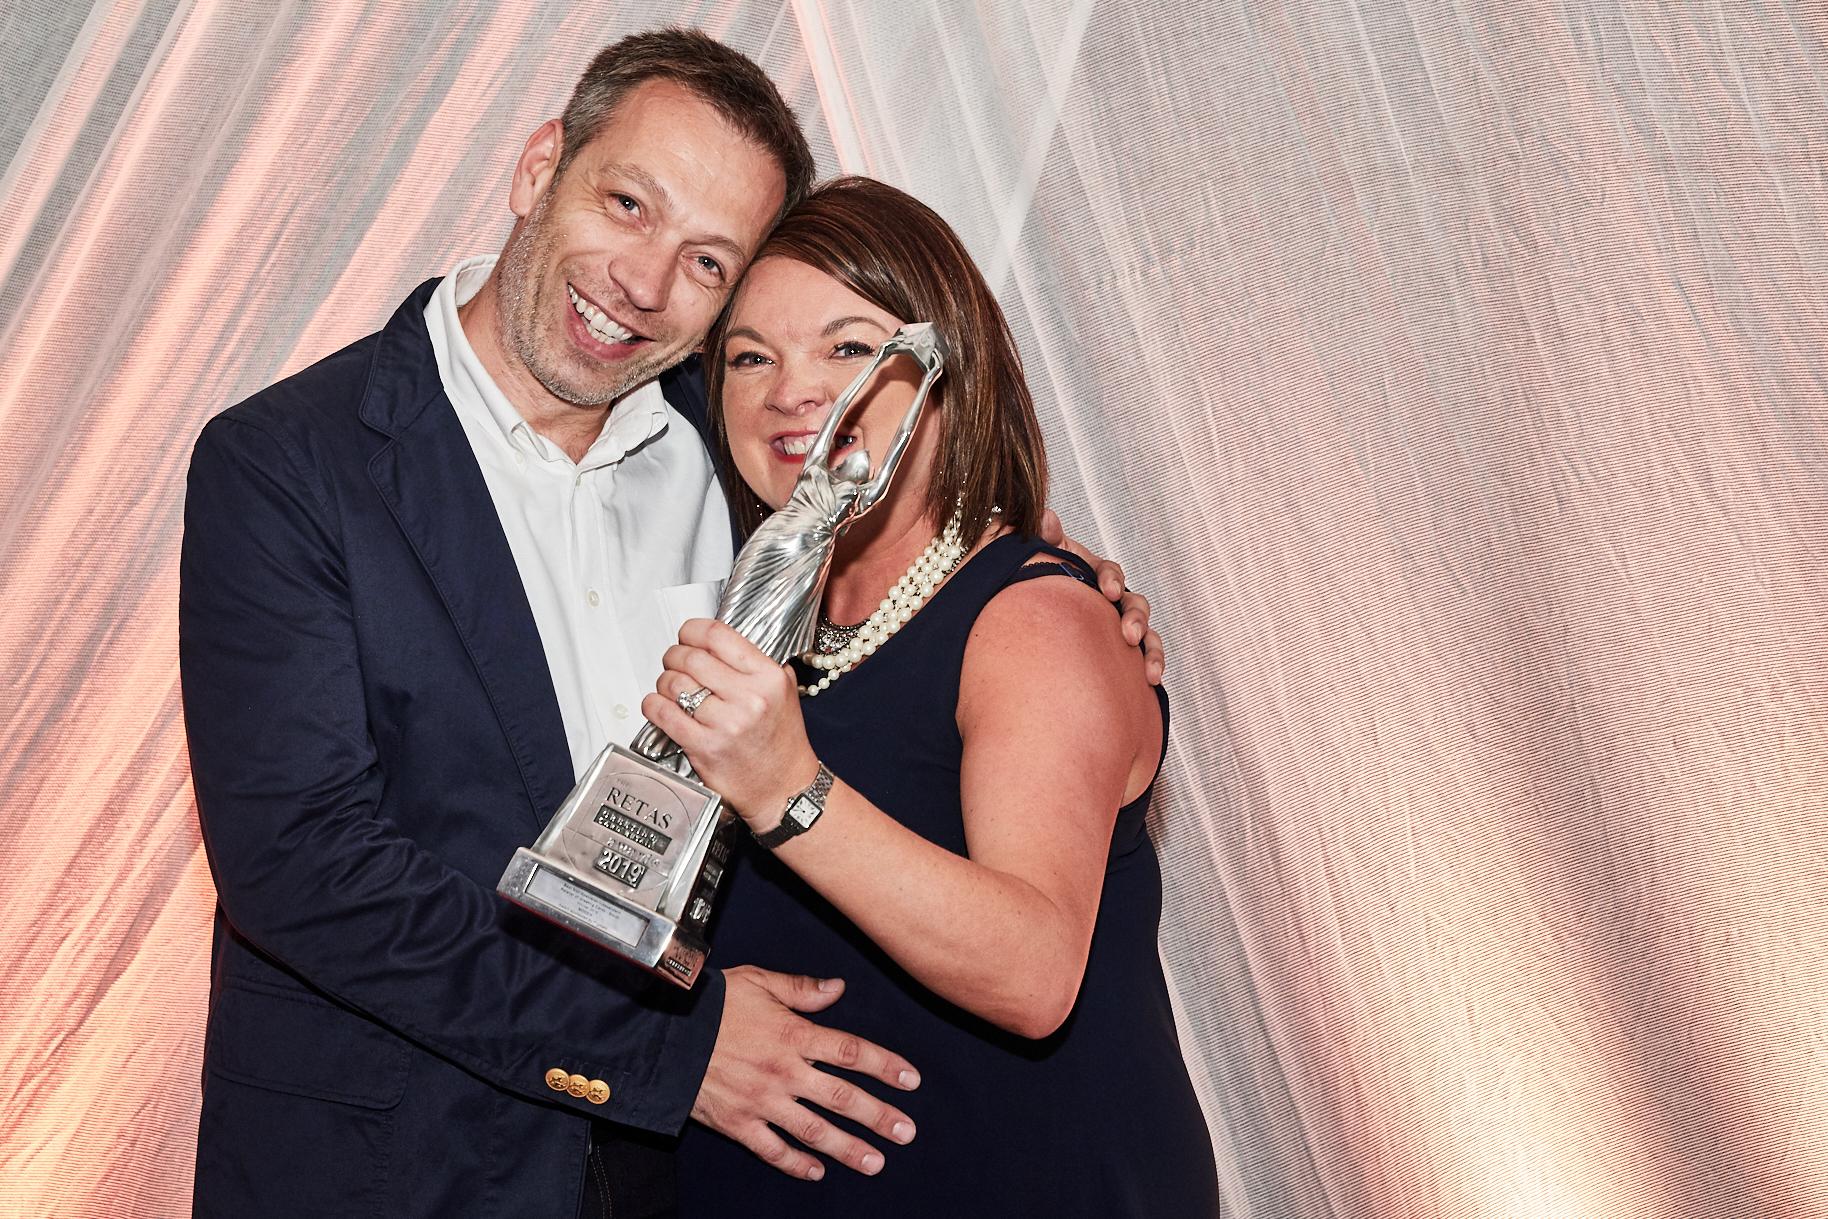 Above: Rachel and Paul Roberts with their Retas award.